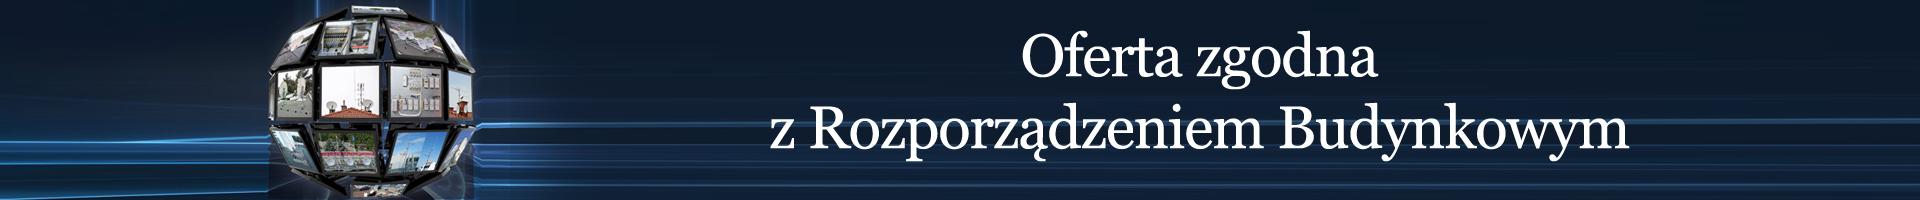 SLIDER_tvzbiorowa_ozzrb